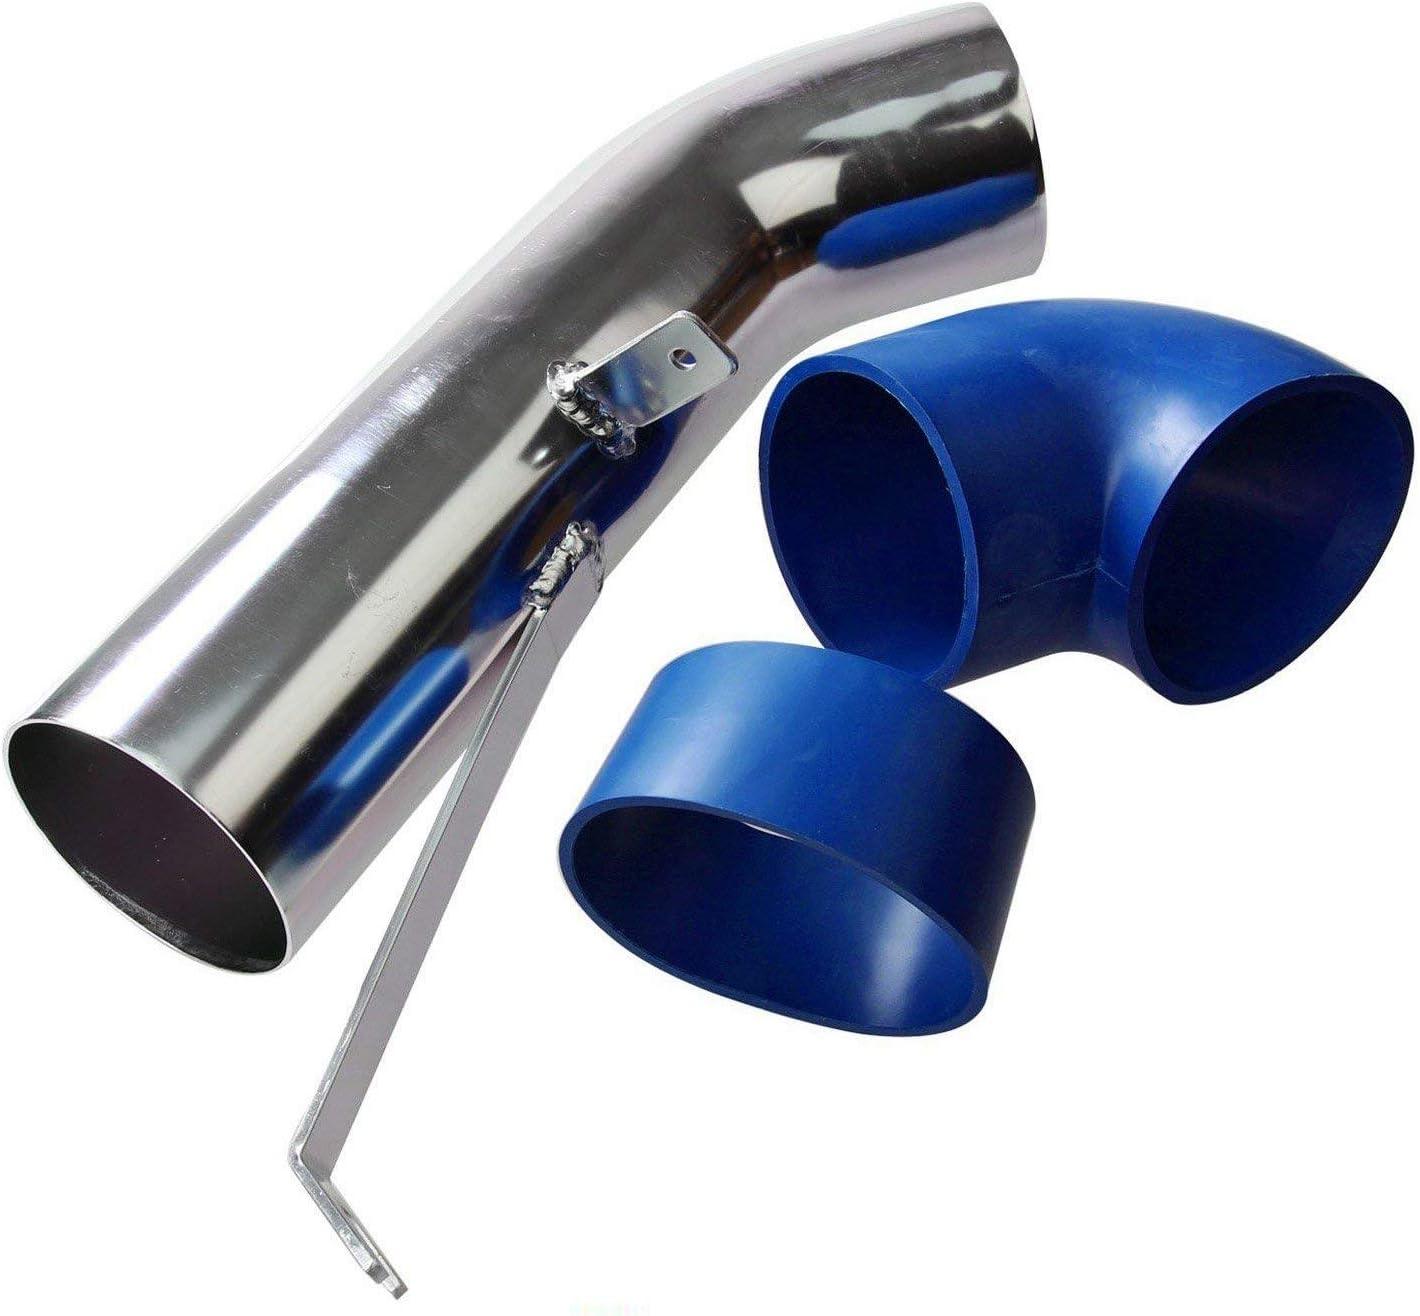 Dromedary Blue Heat Shield Cold Air Intake For Silverado 4.8L//5.3L//6.0L 4 2003 2004 2005 2006